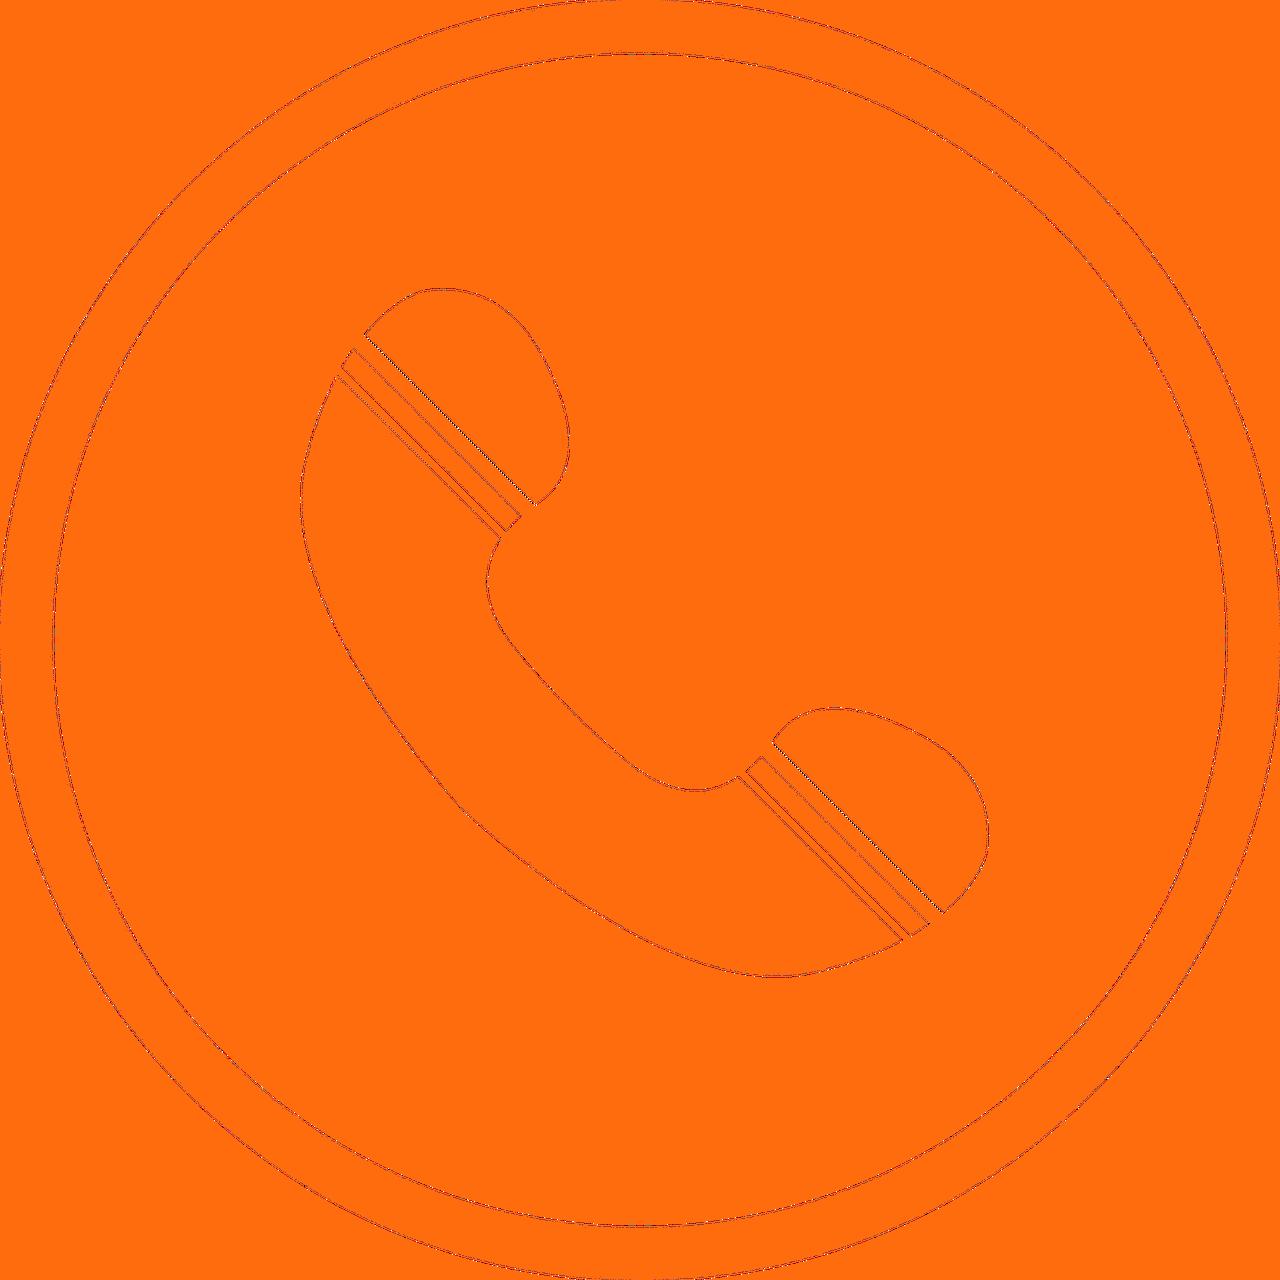 Symbol for phone